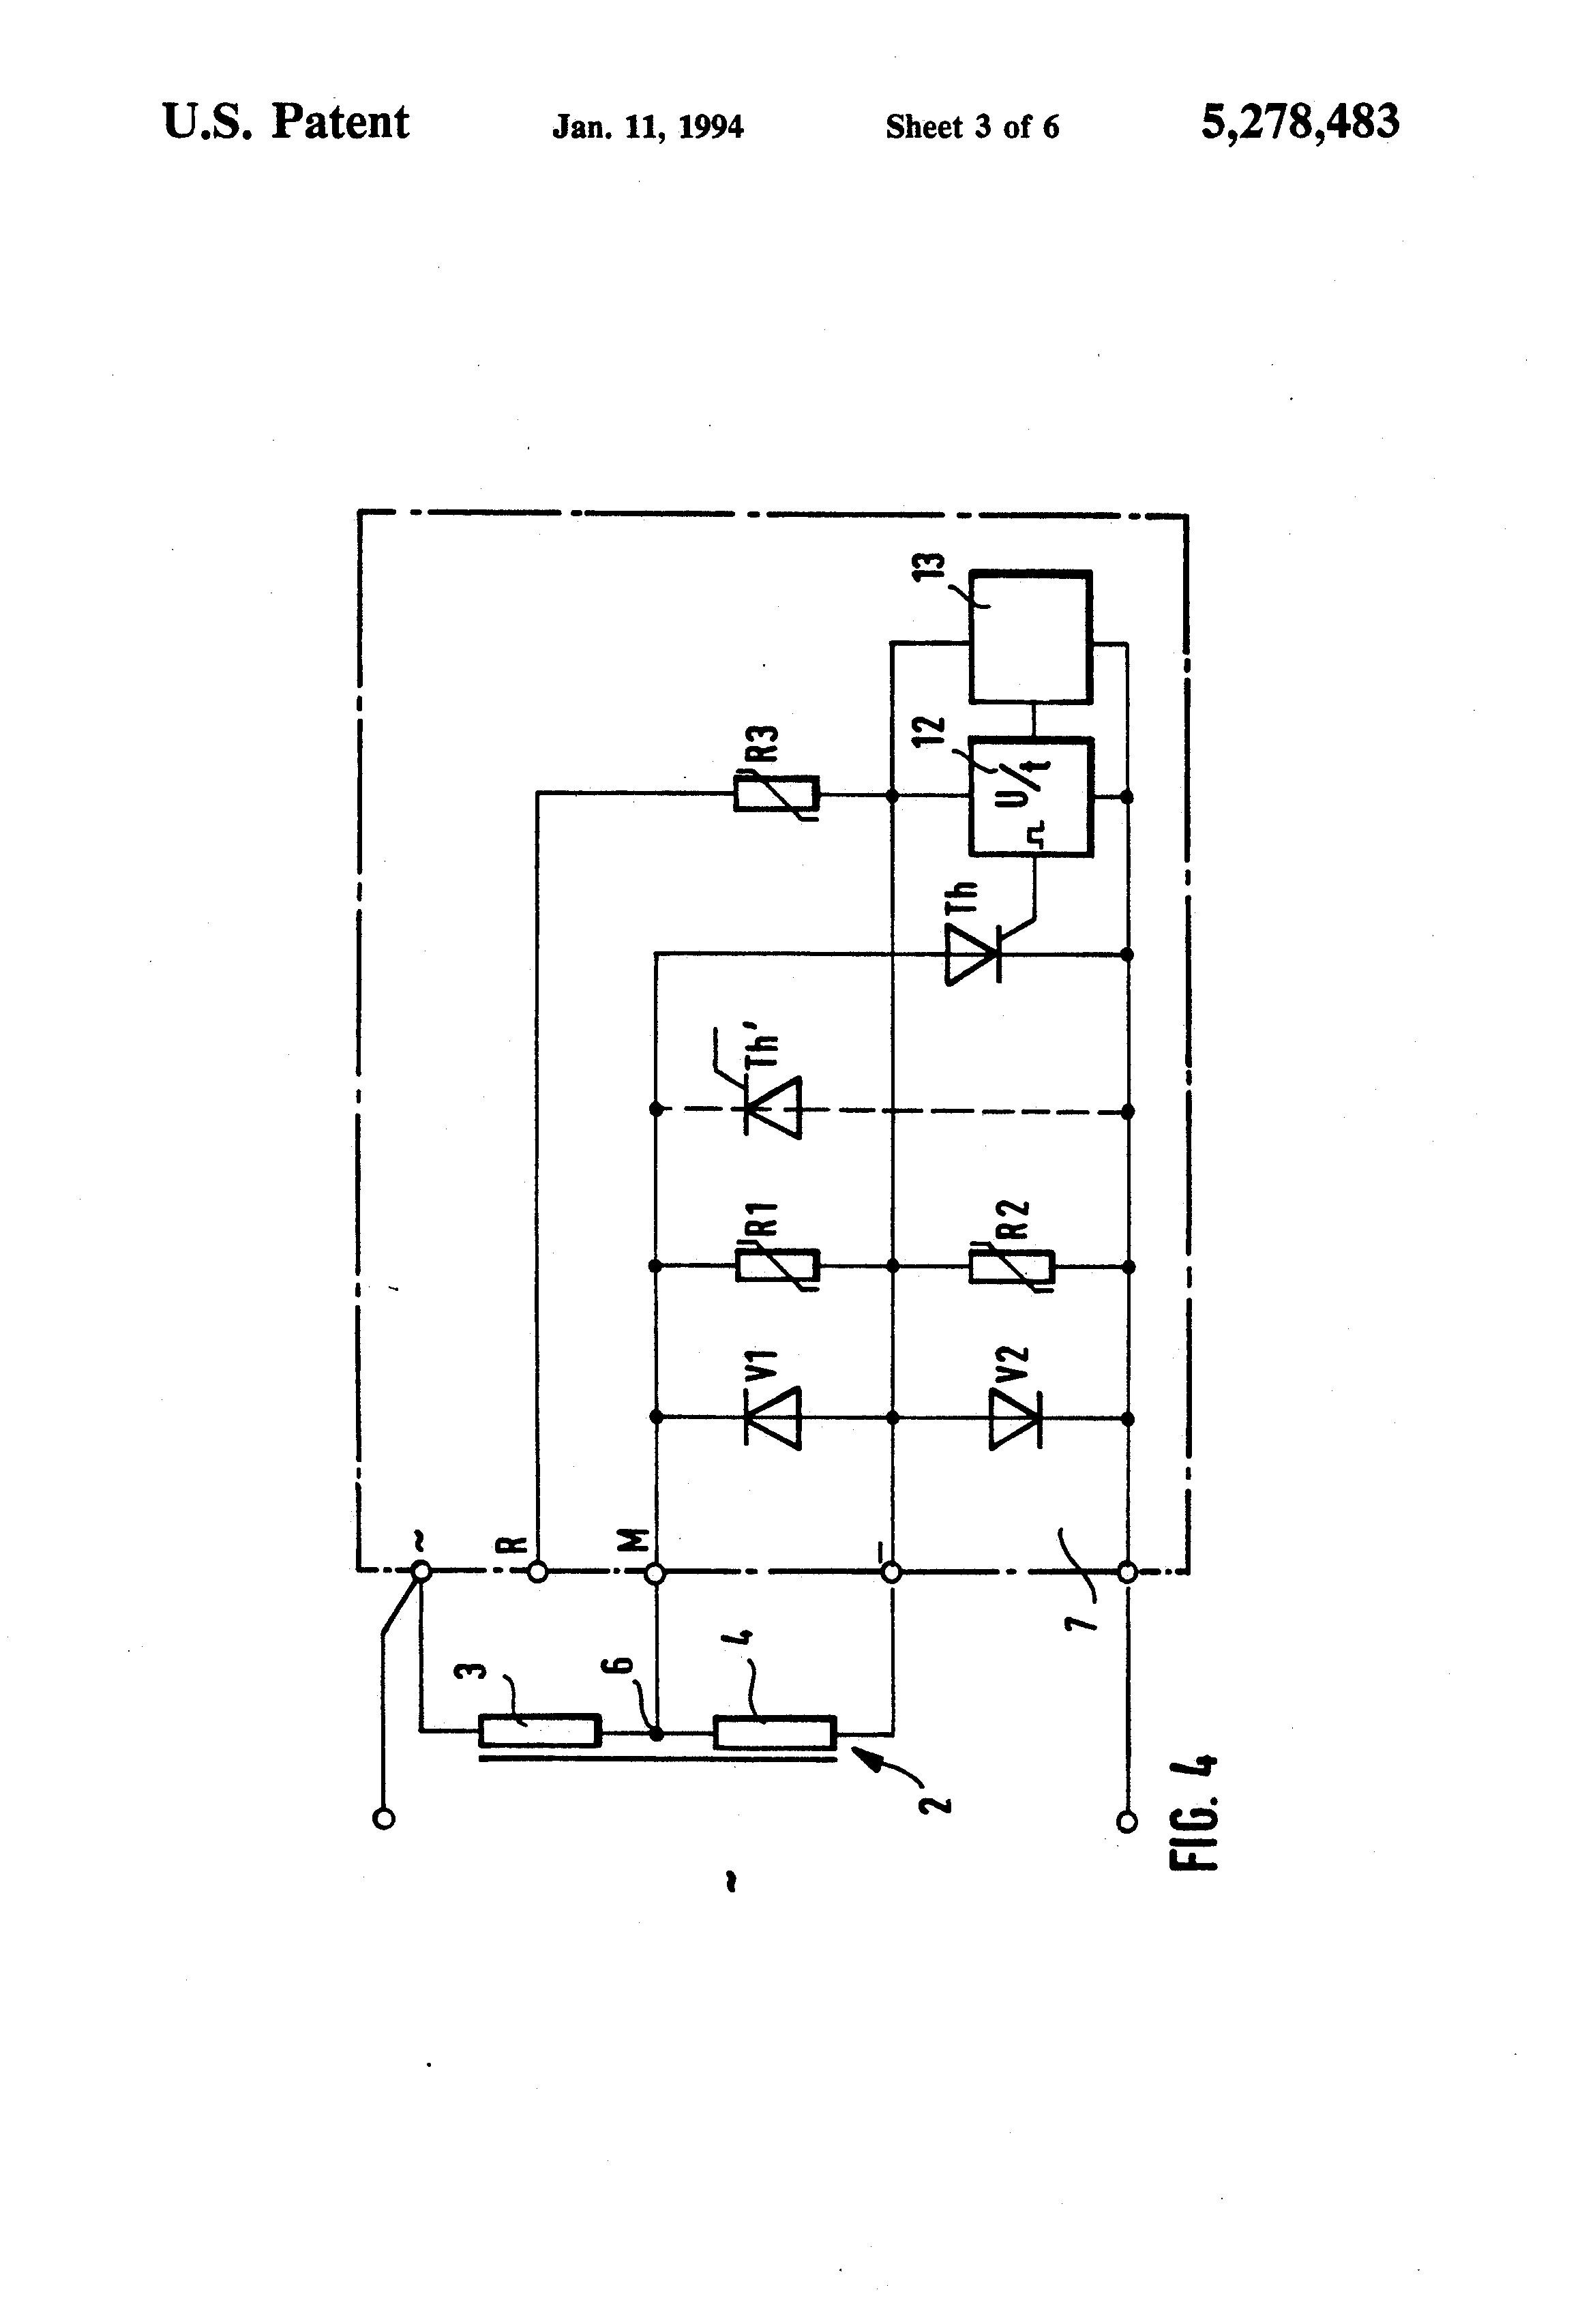 Sew Eurodrive Motor Wiring Diagram Archive Of Automotive 6 Square Lead Motorssite Org Rh